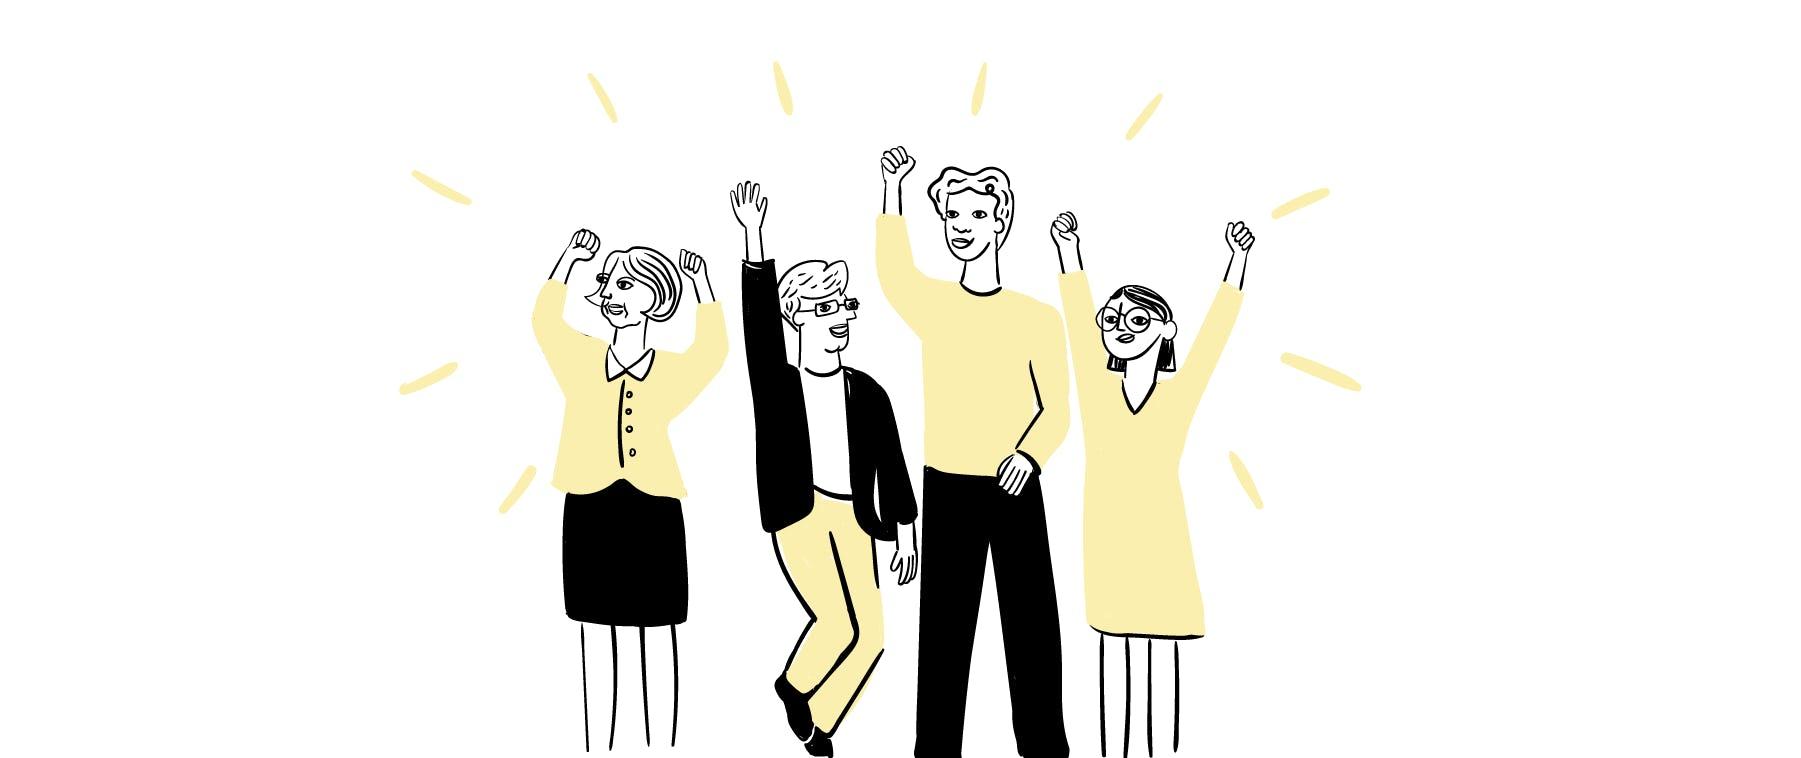 democratic-leadership-enthusiasm-team-pleo-blog